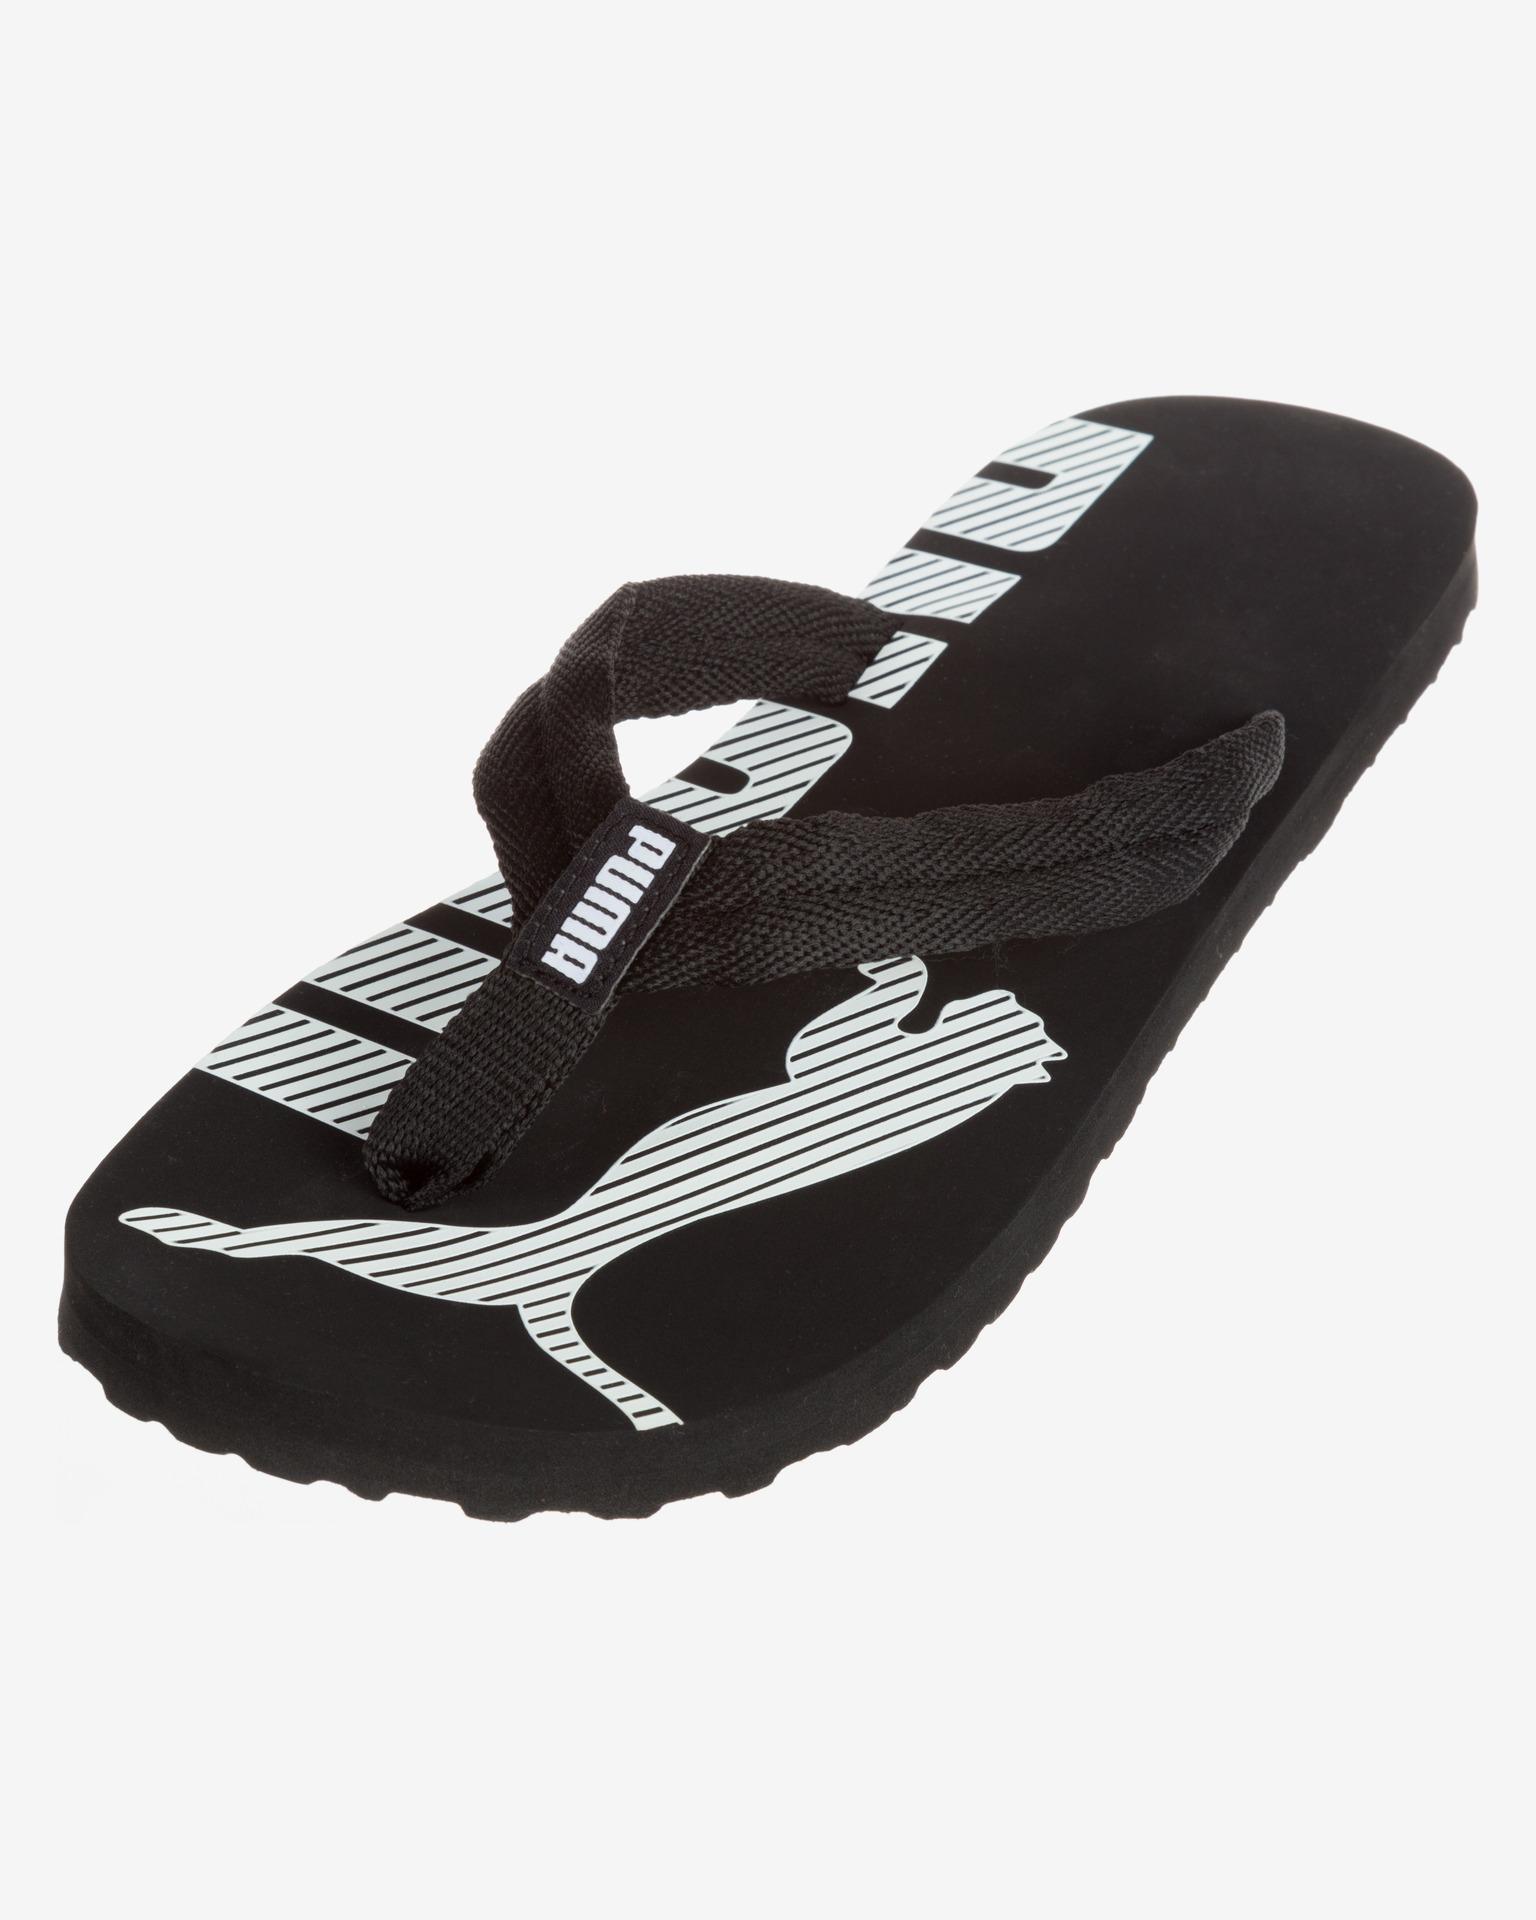 chaussures de sport 41ed6 a1752 Puma - Epic Flip-flops Bibloo.com